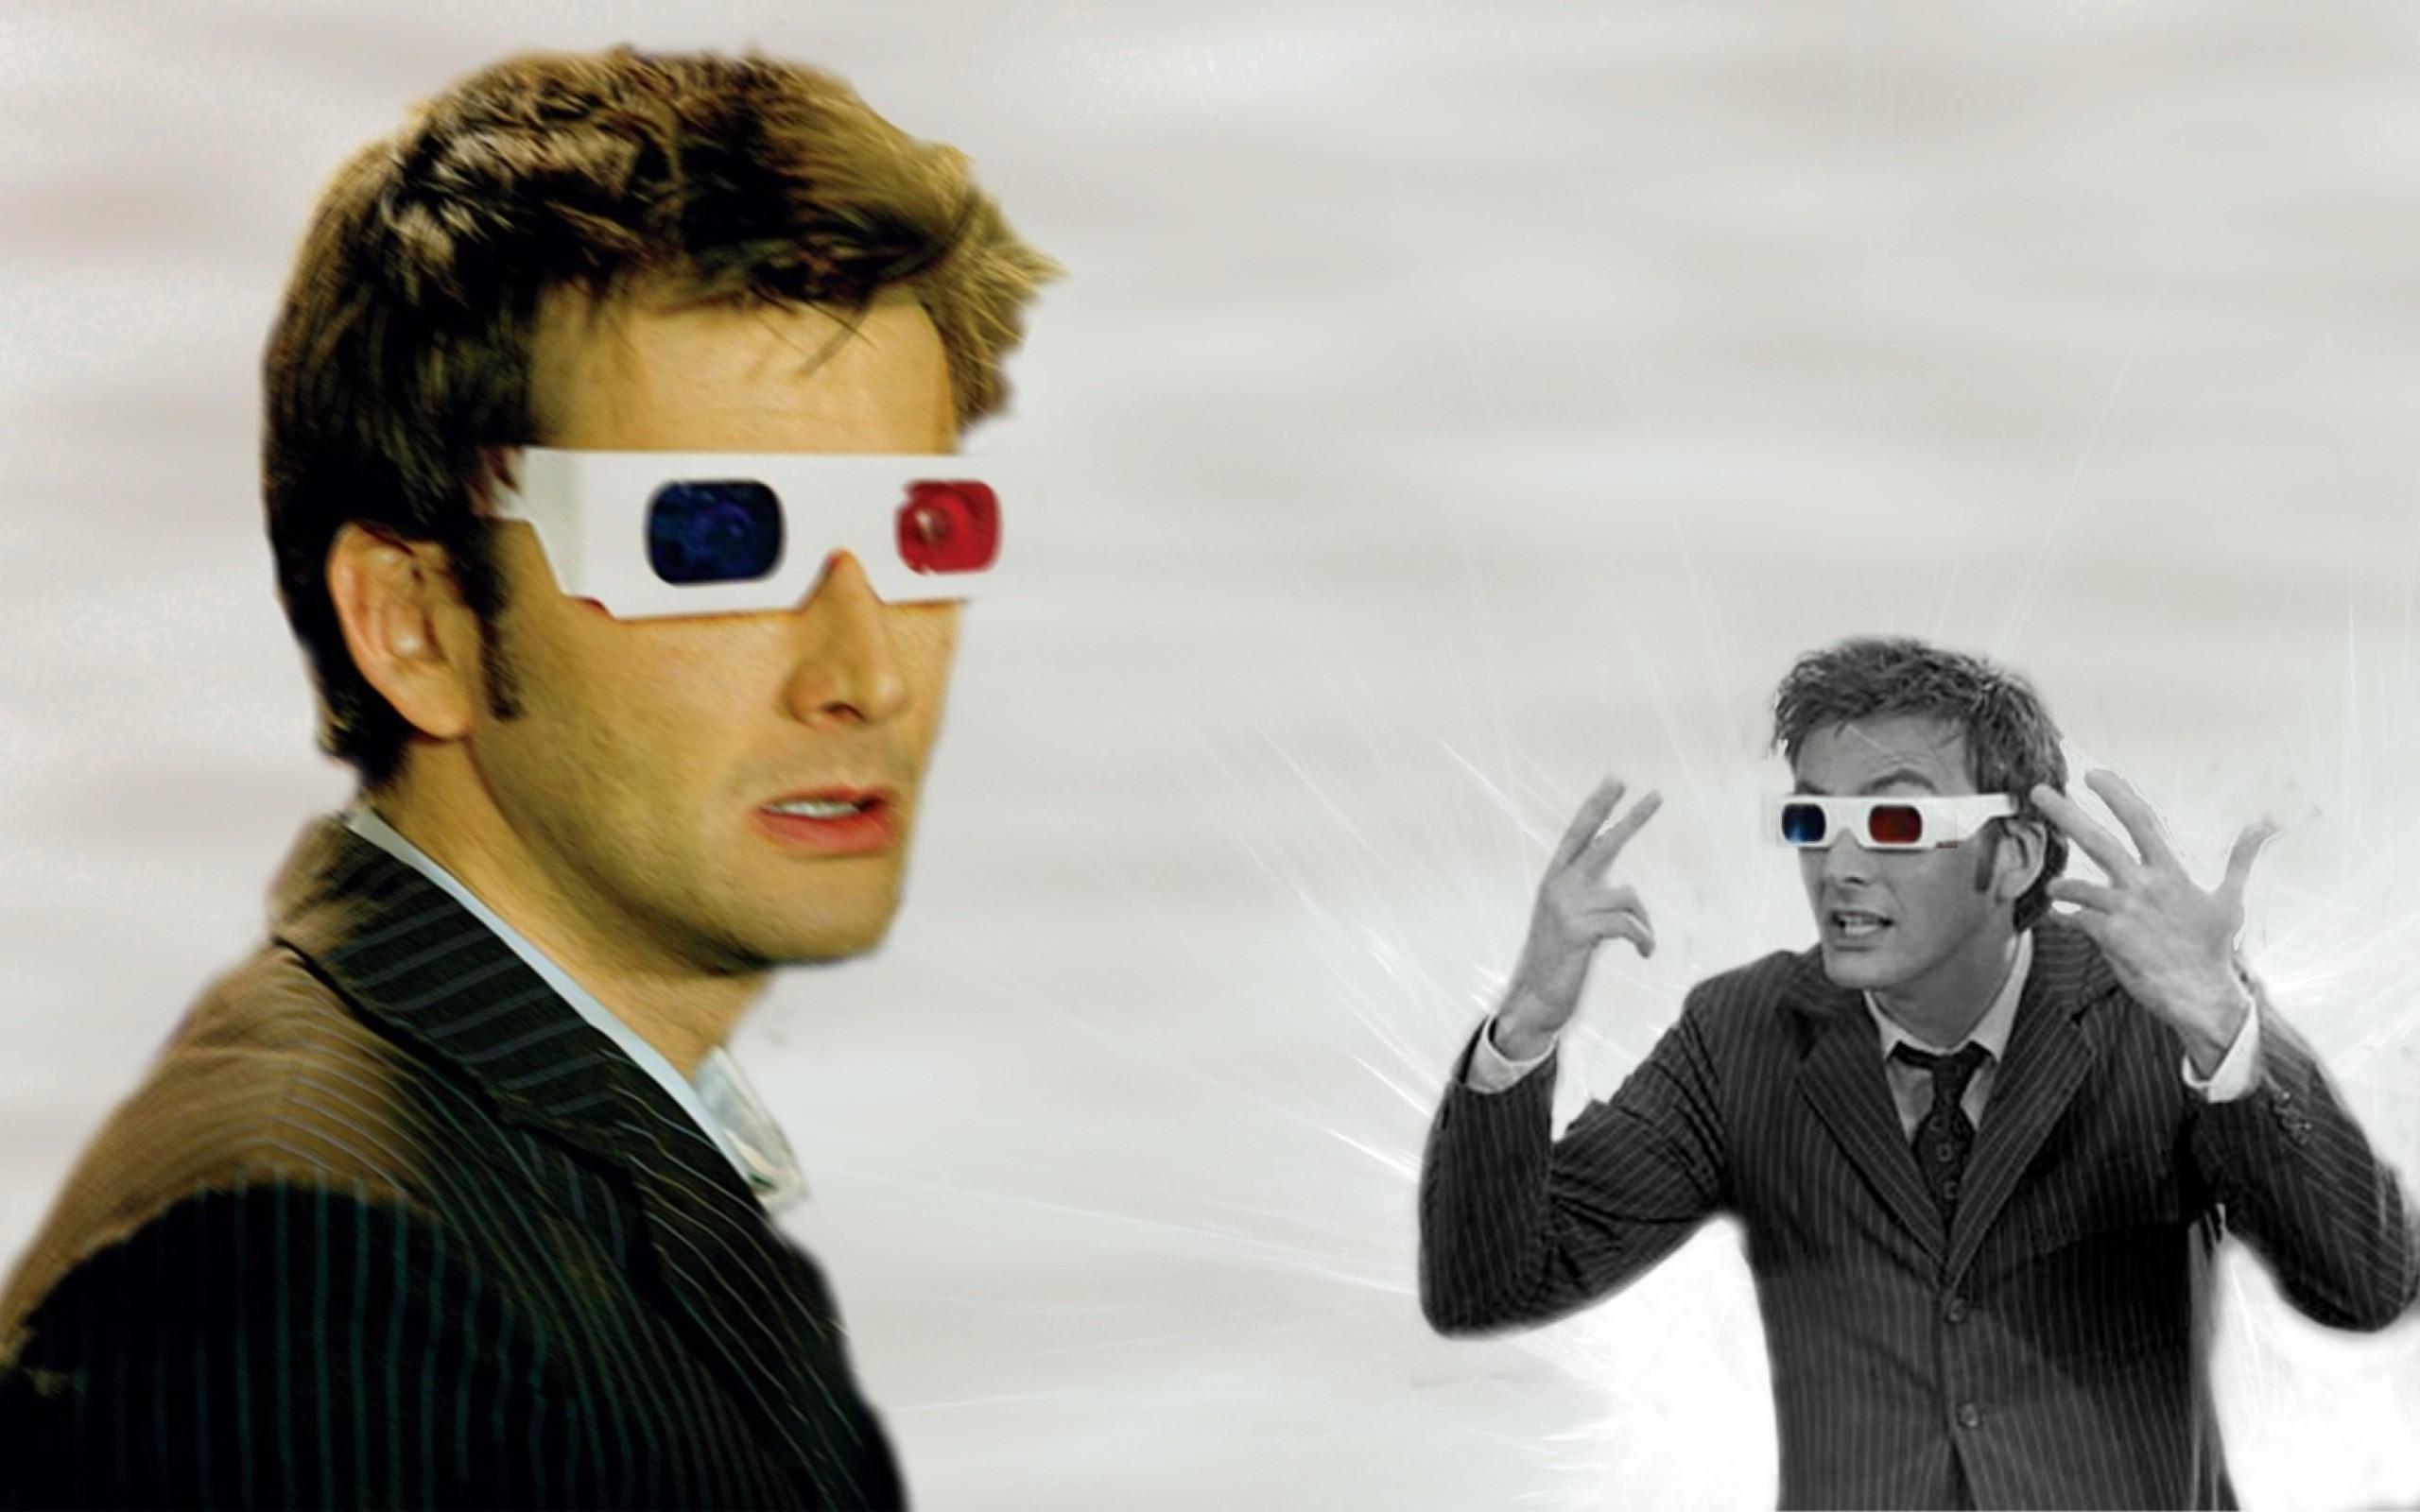 david tennant doctor who tenth doctor 3d glasses 1680×1050 wallpaper Art HD  Wallpaper